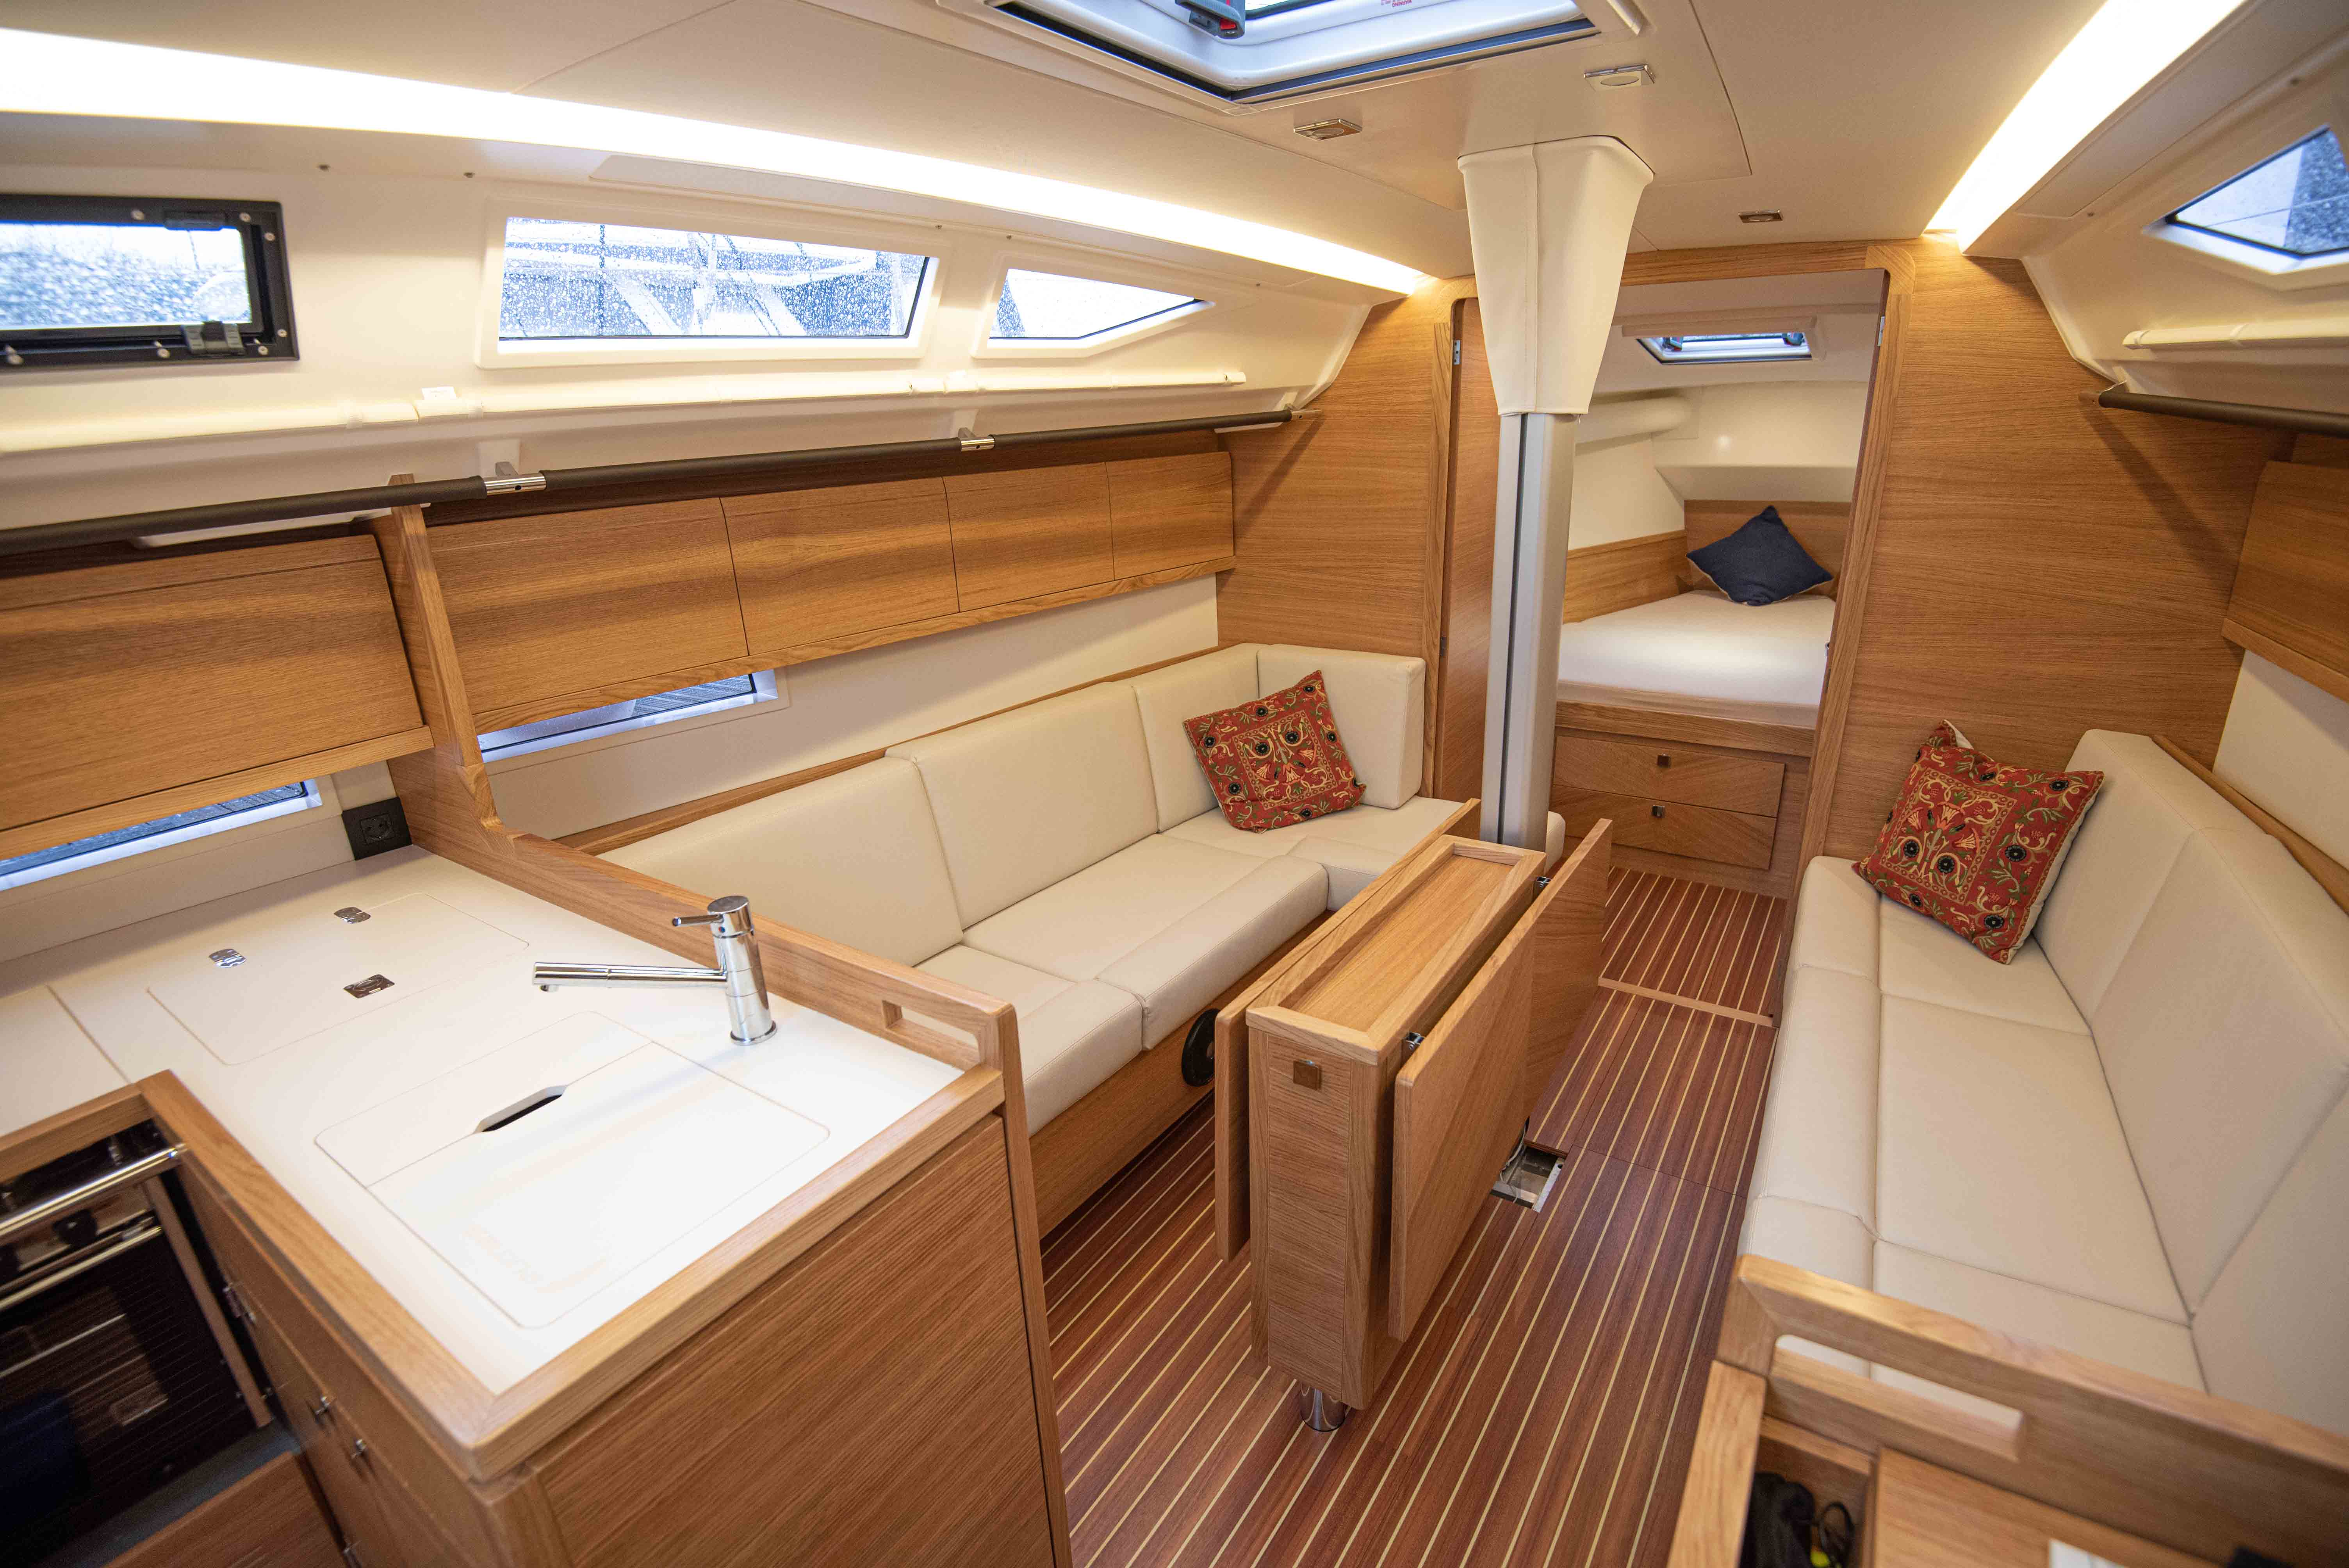 Salona Sailing boat interior